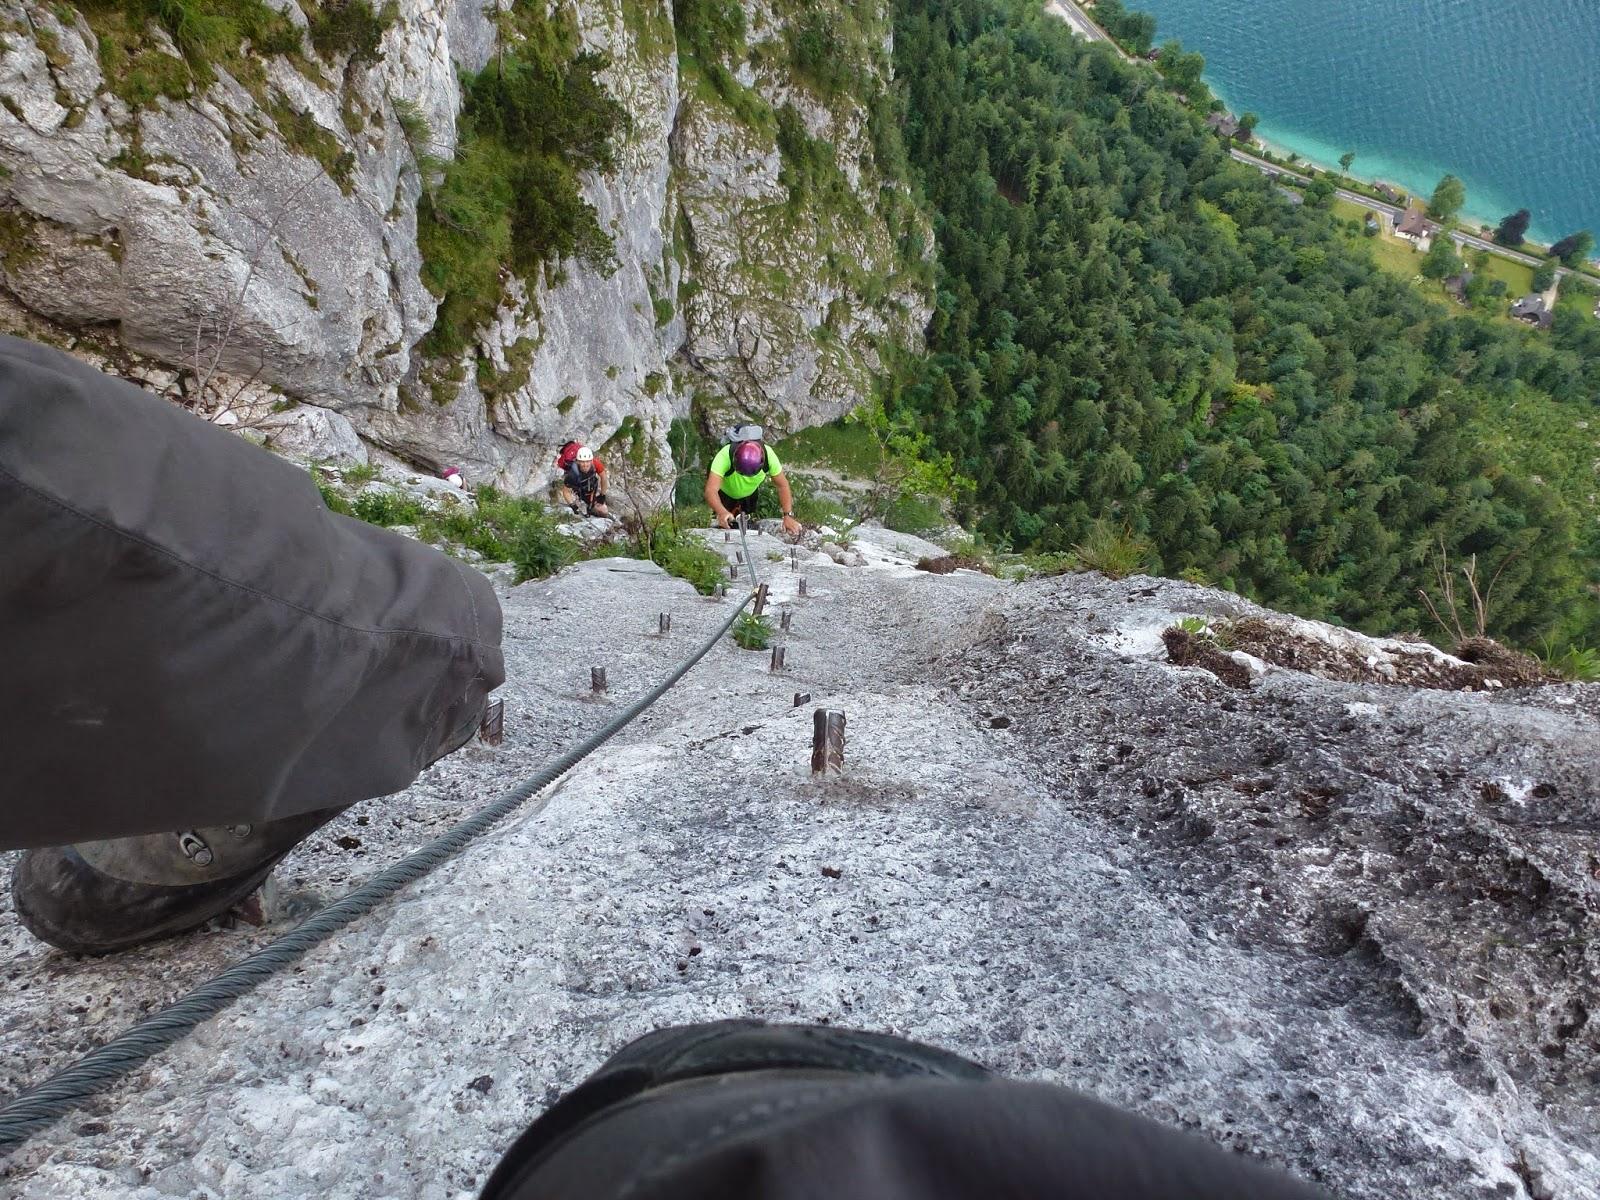 Klettersteig Mahdlgupf : Achis gipfelpunkte: mahdlgupf 1.261 m